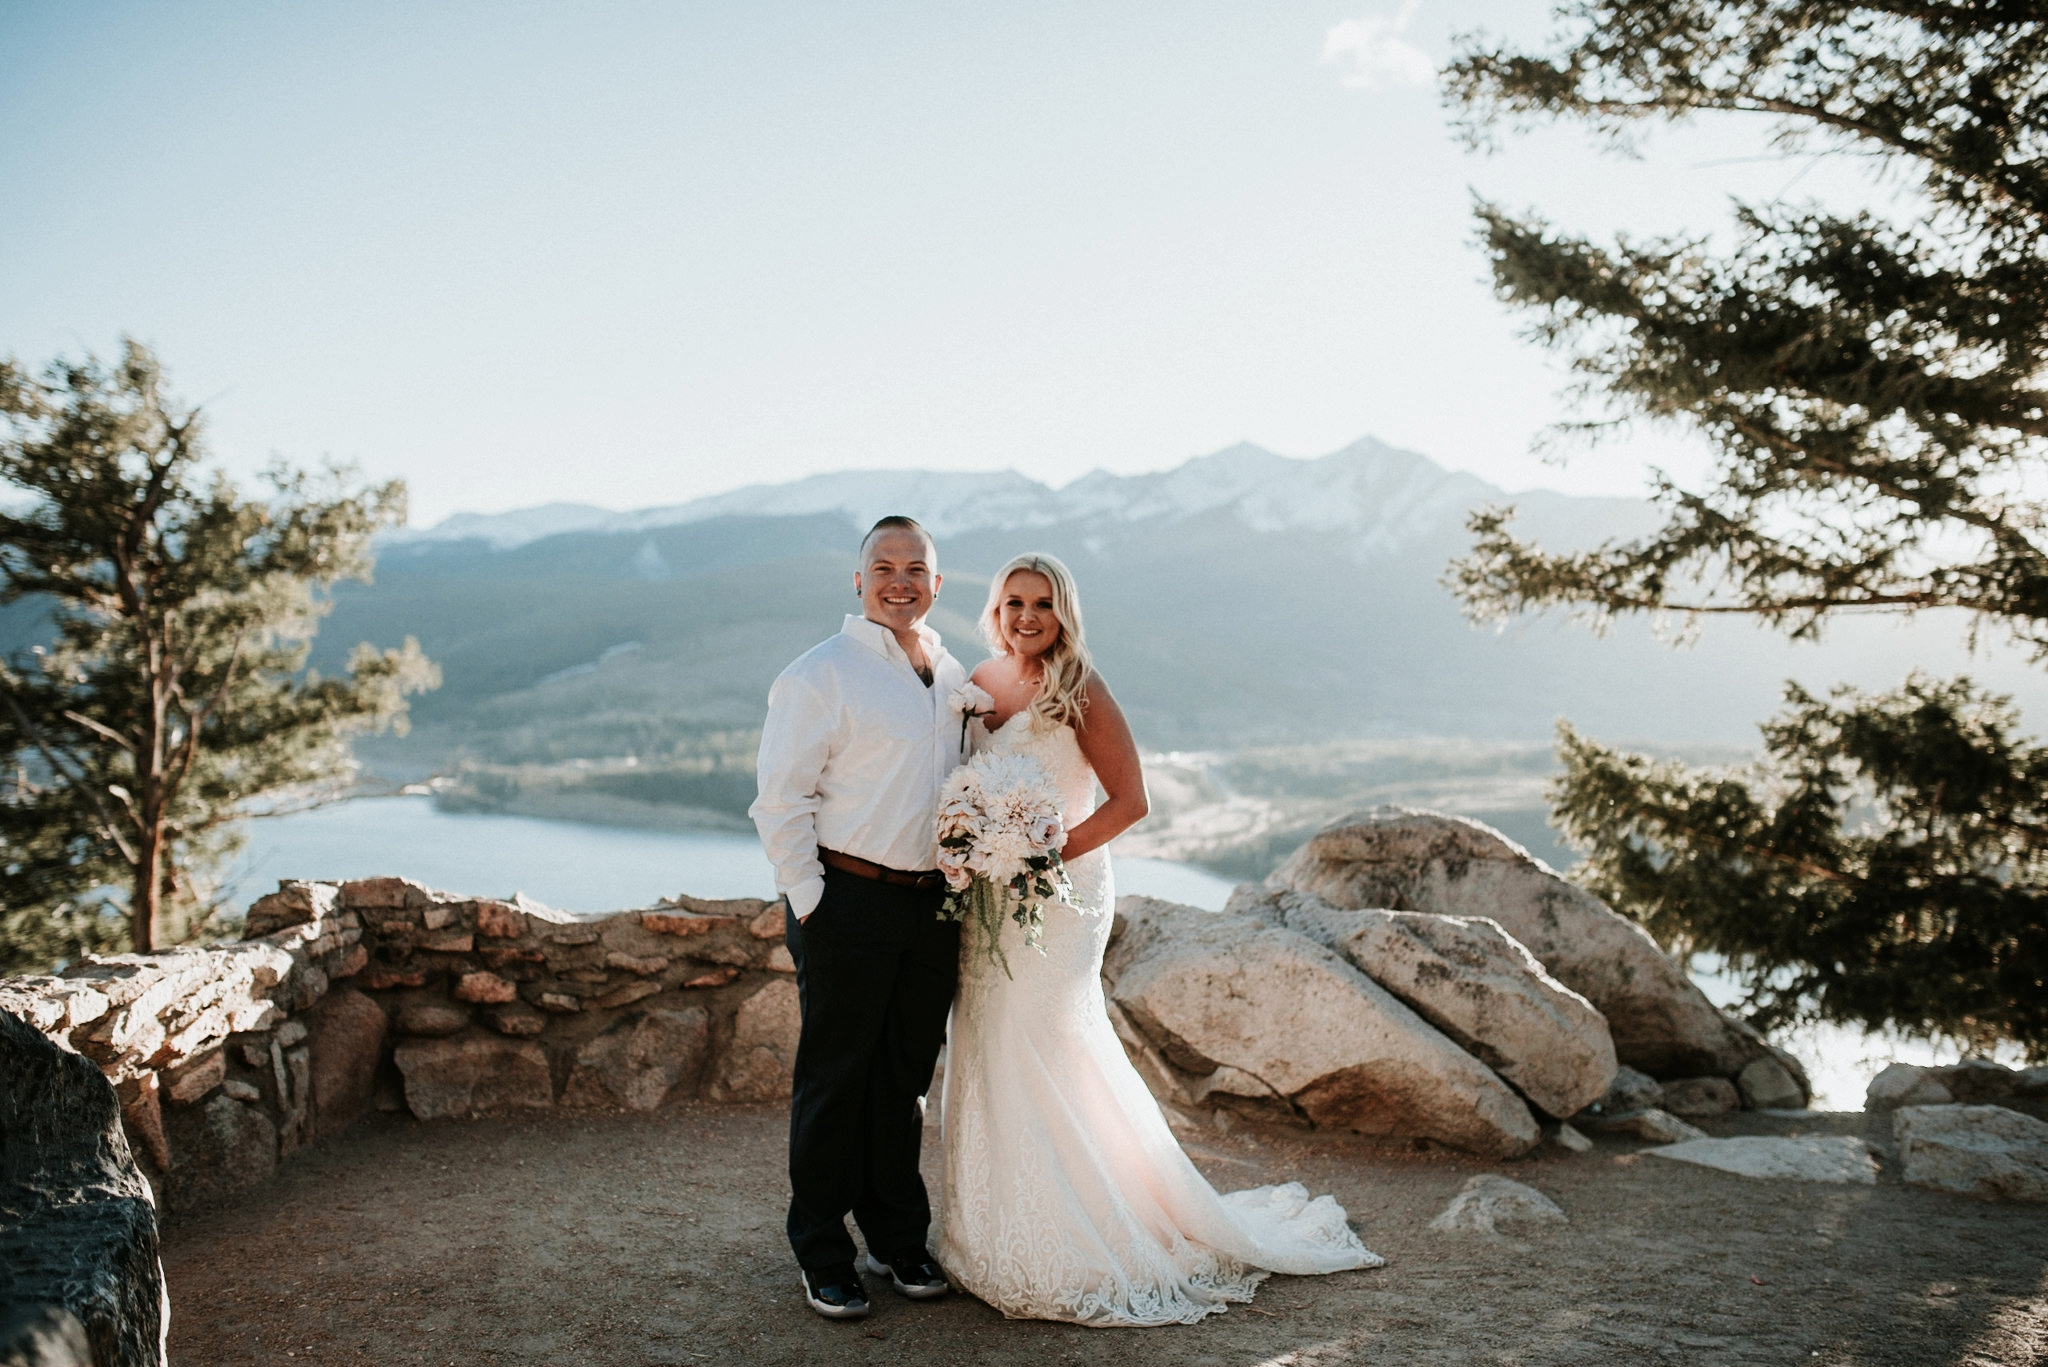 Zach&Rosalie St. Louis Wedding Photographer - Elopement at Lake Dillon CO-4298.jpg